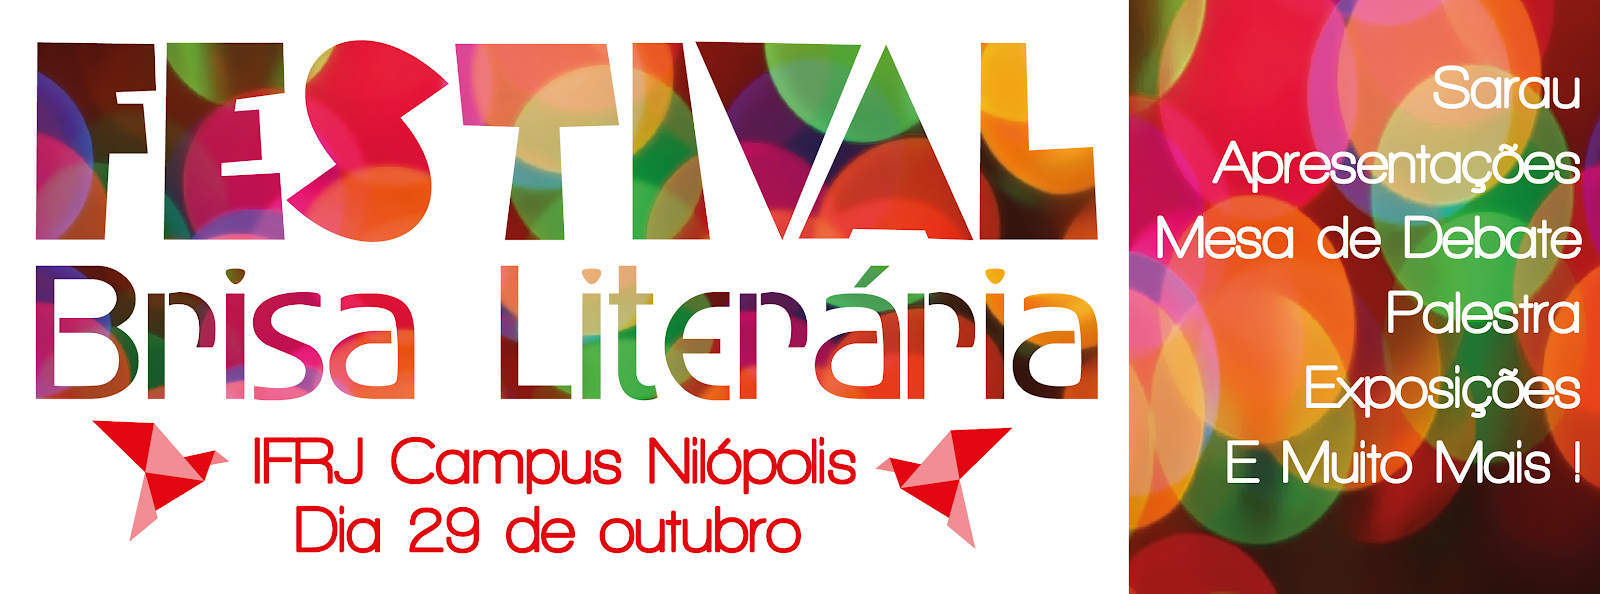 capa festival-01.png